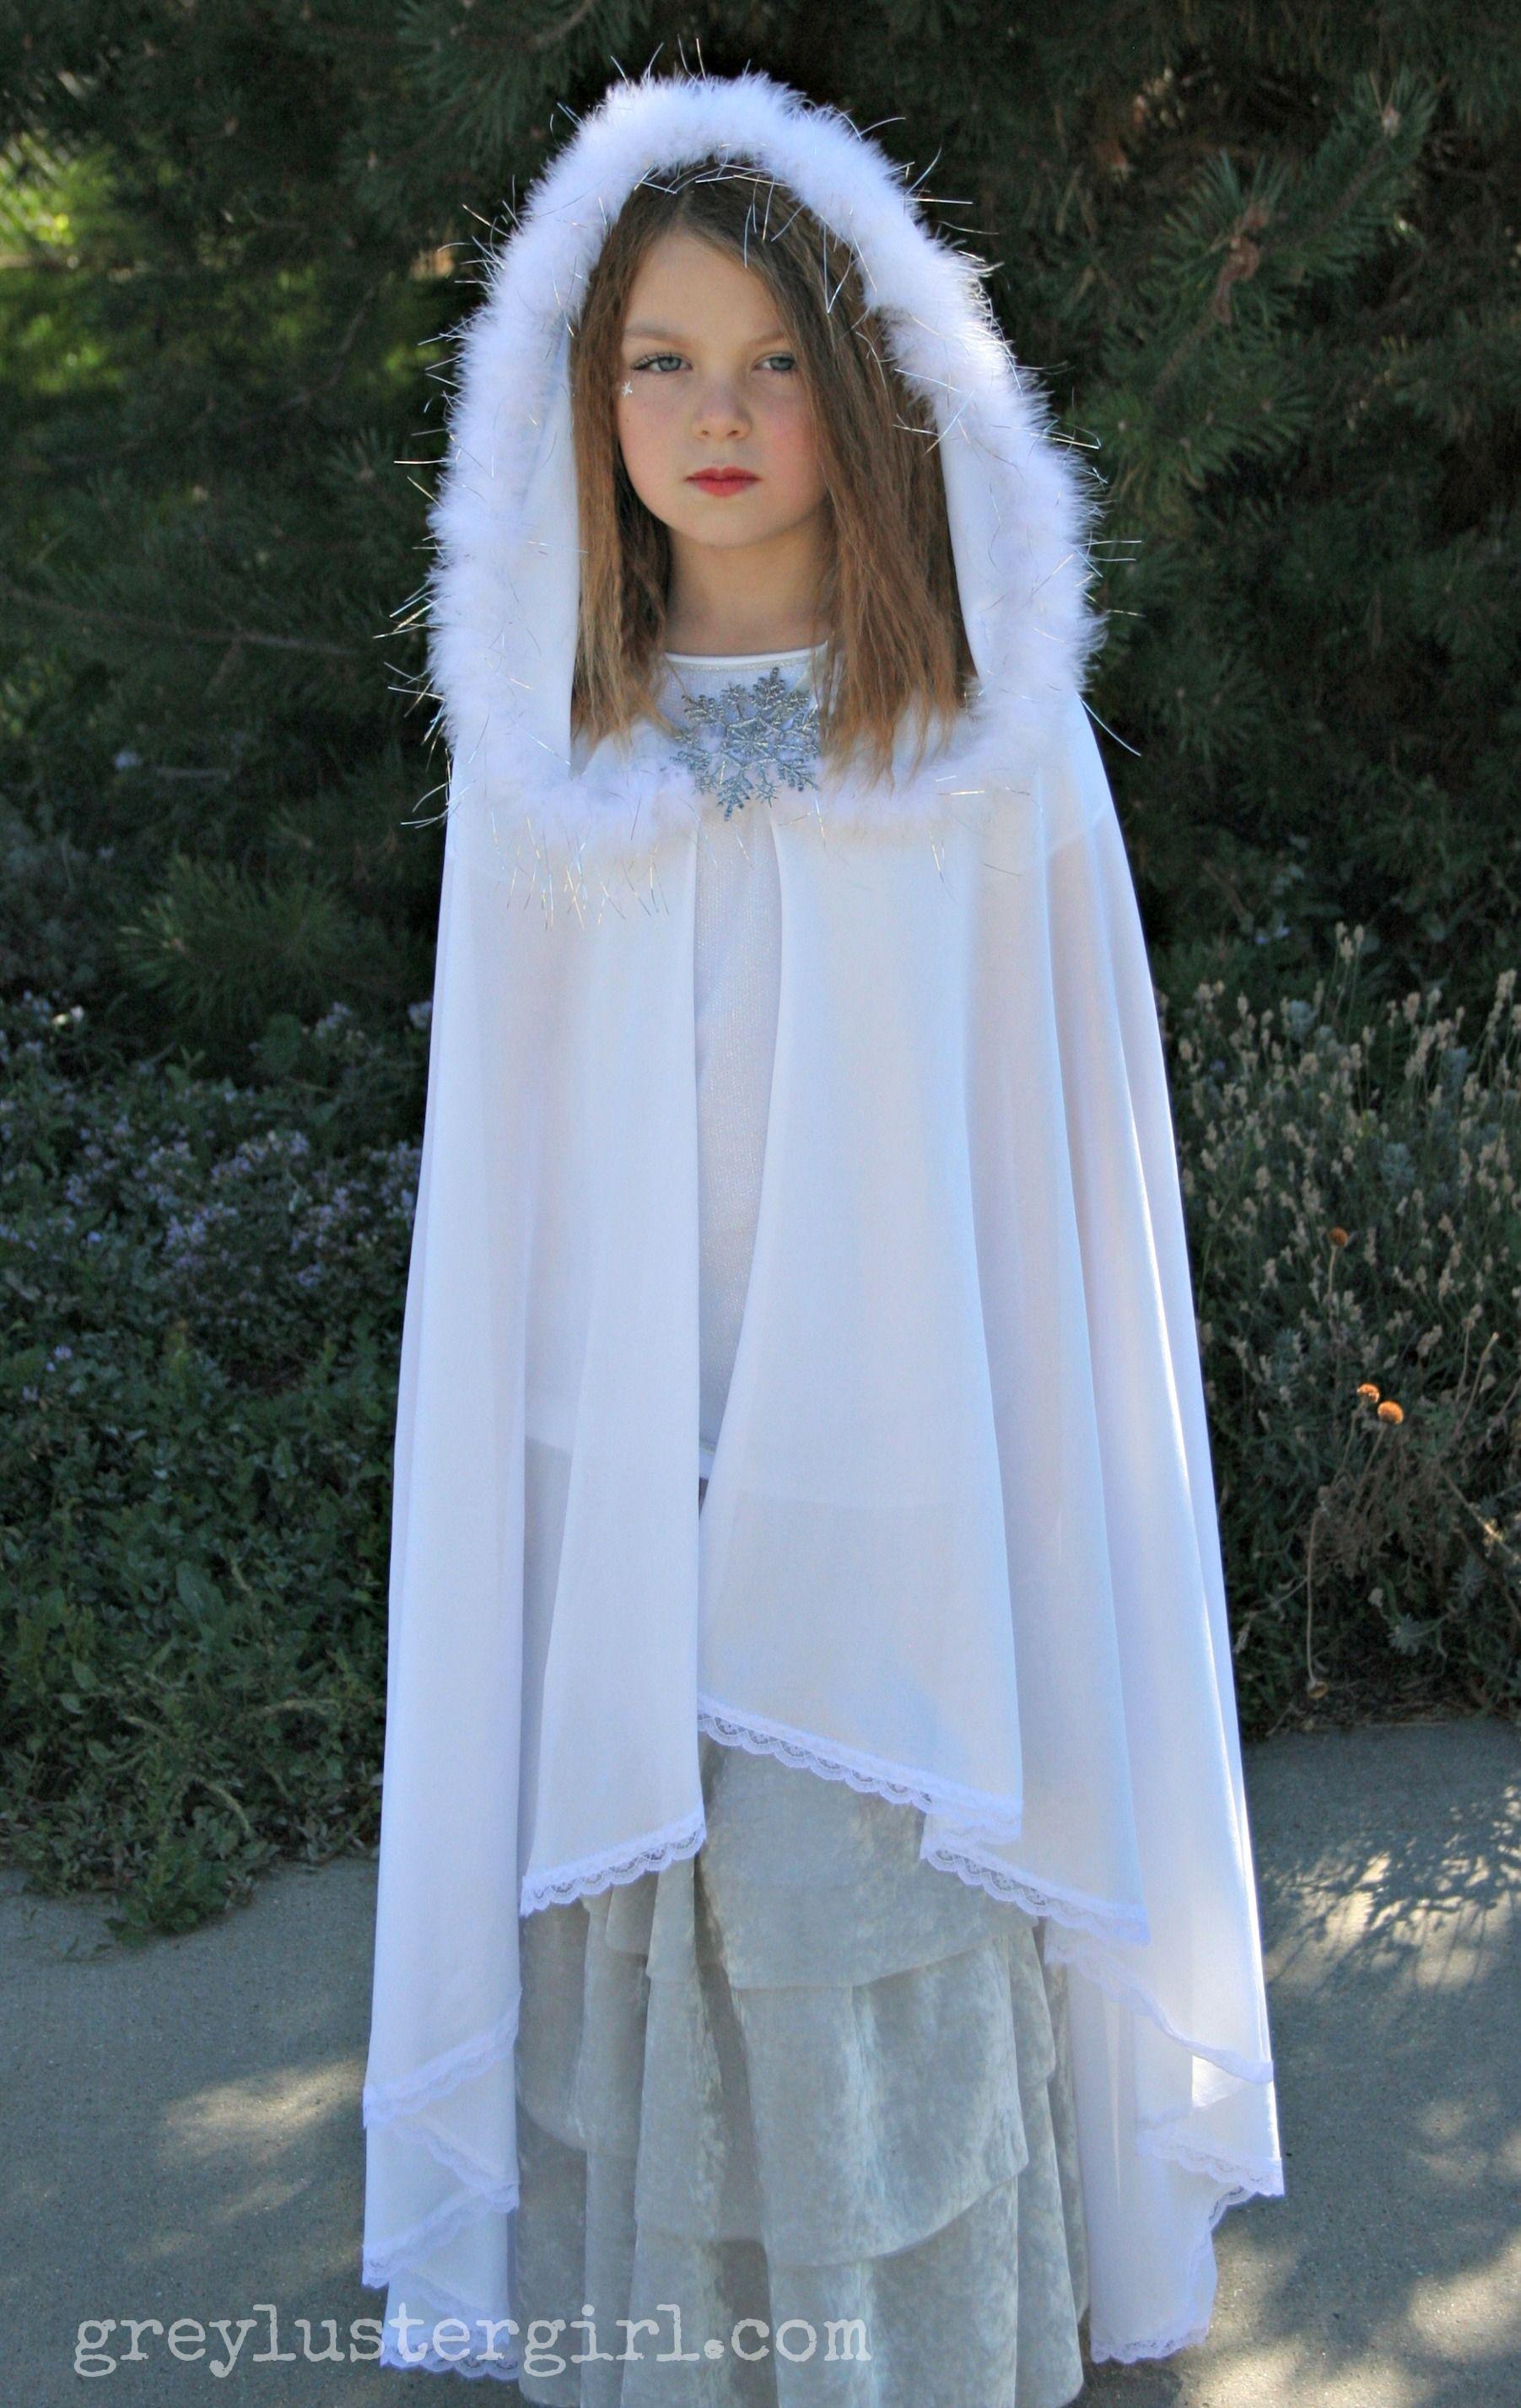 Kid Girl Hooded Princess Cape Coat Fur Cloak Christmas Party Costume Fancy Dress